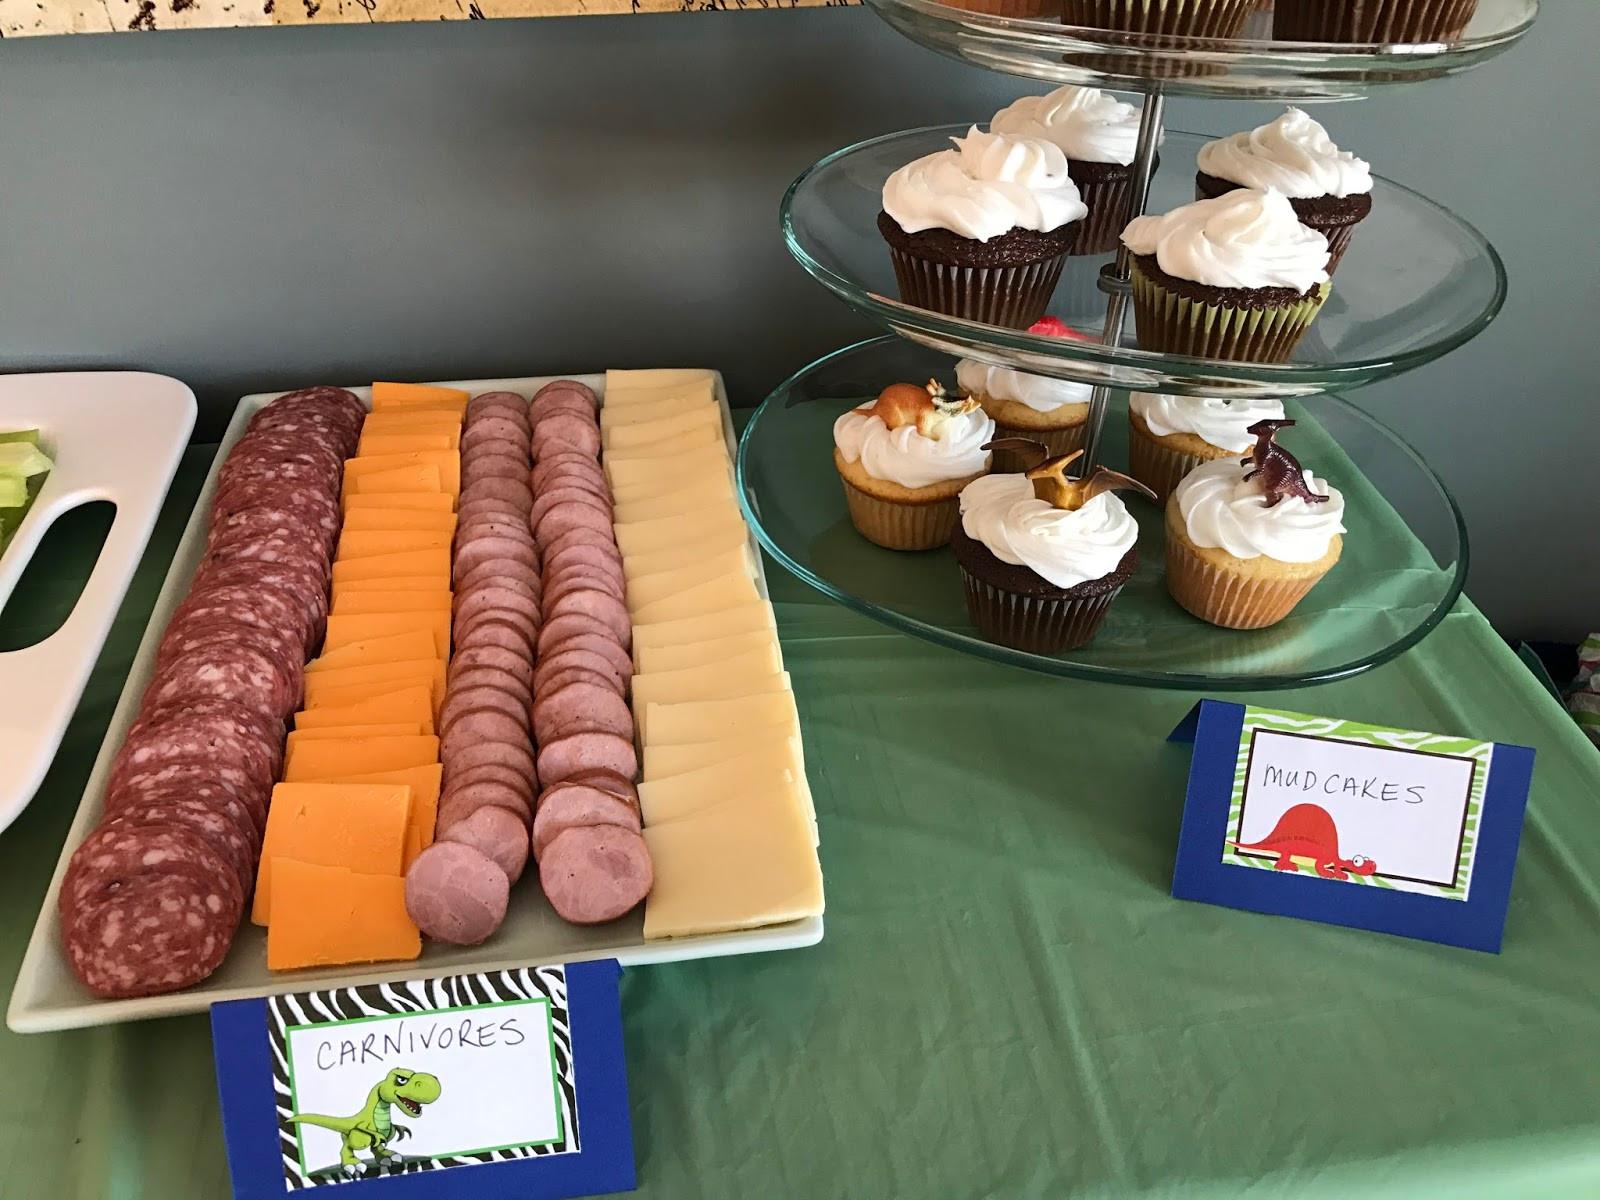 Dinosaur Food Ideas For Birthday Party  A Slice of Brie A Dinosaur Themed Birthday Party